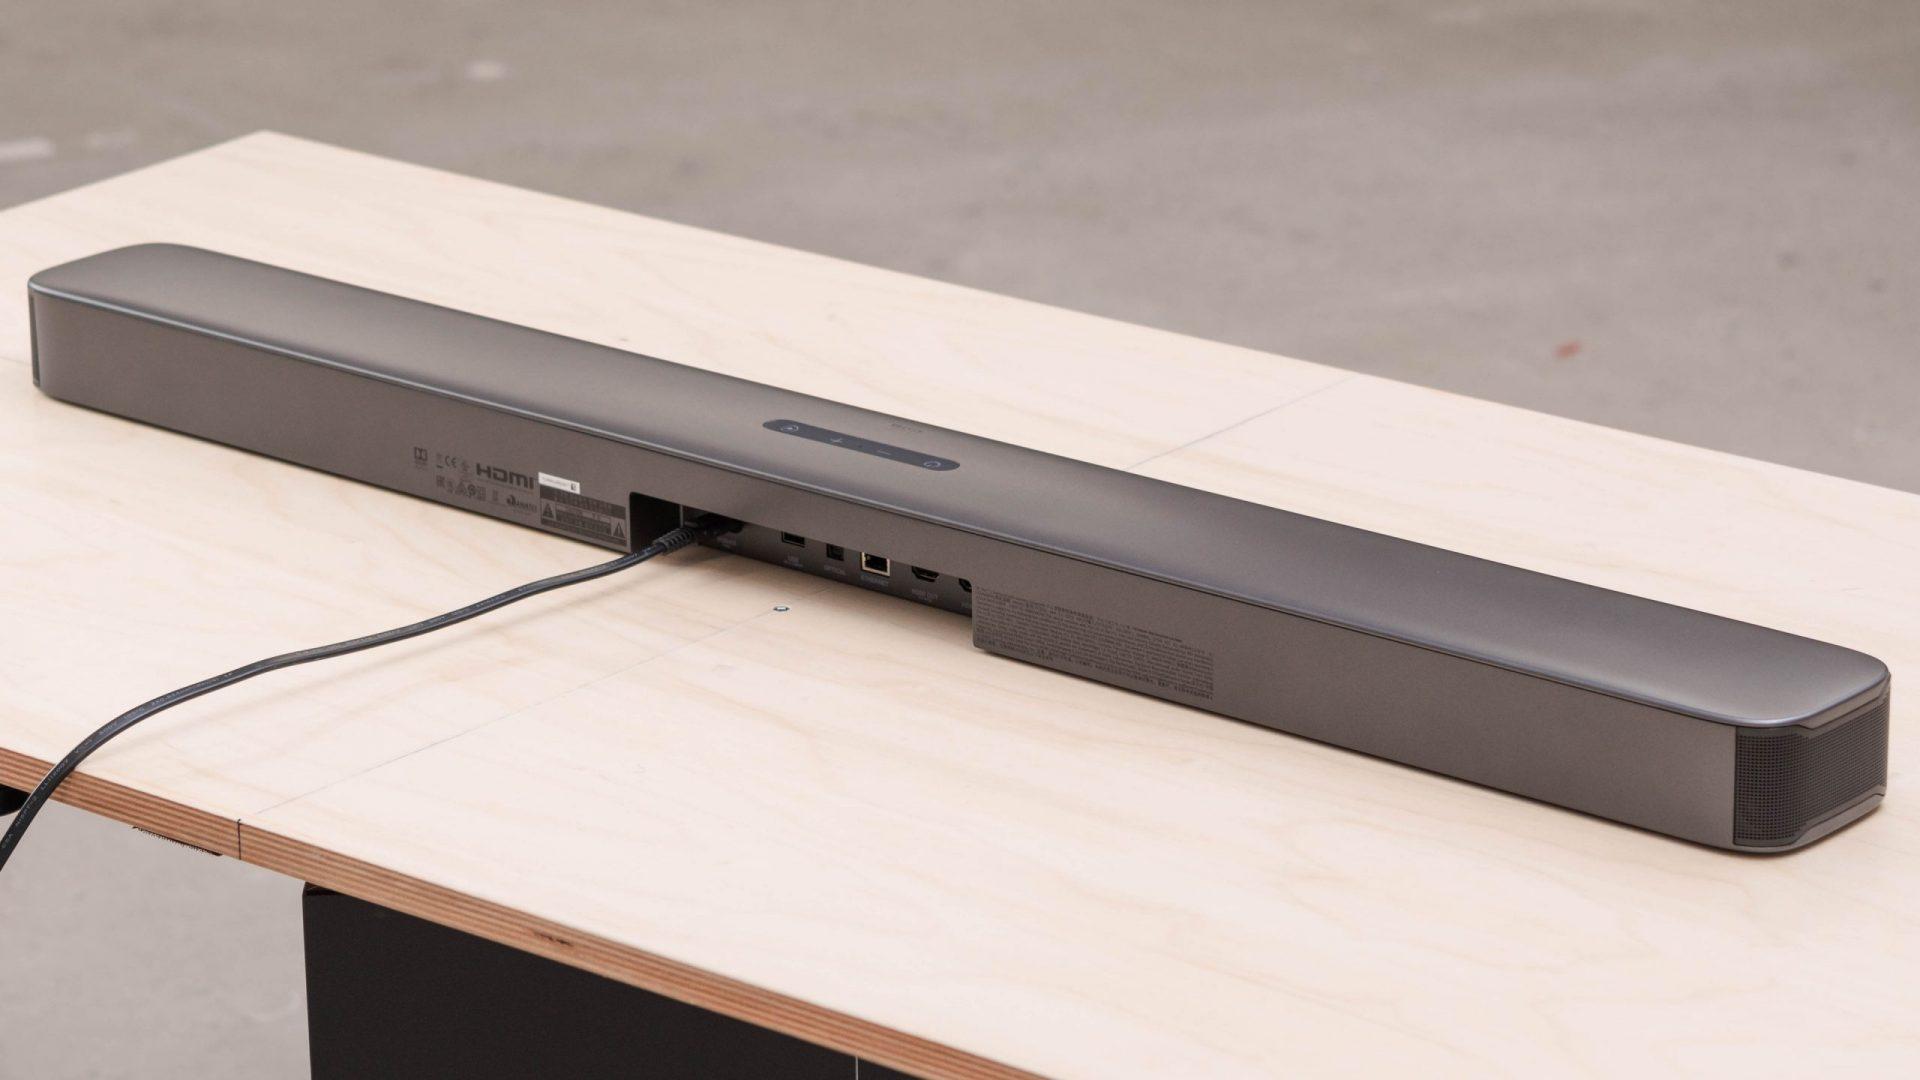 Loa thanh Soundbar JBL Bar 5.1 Surround mat sau